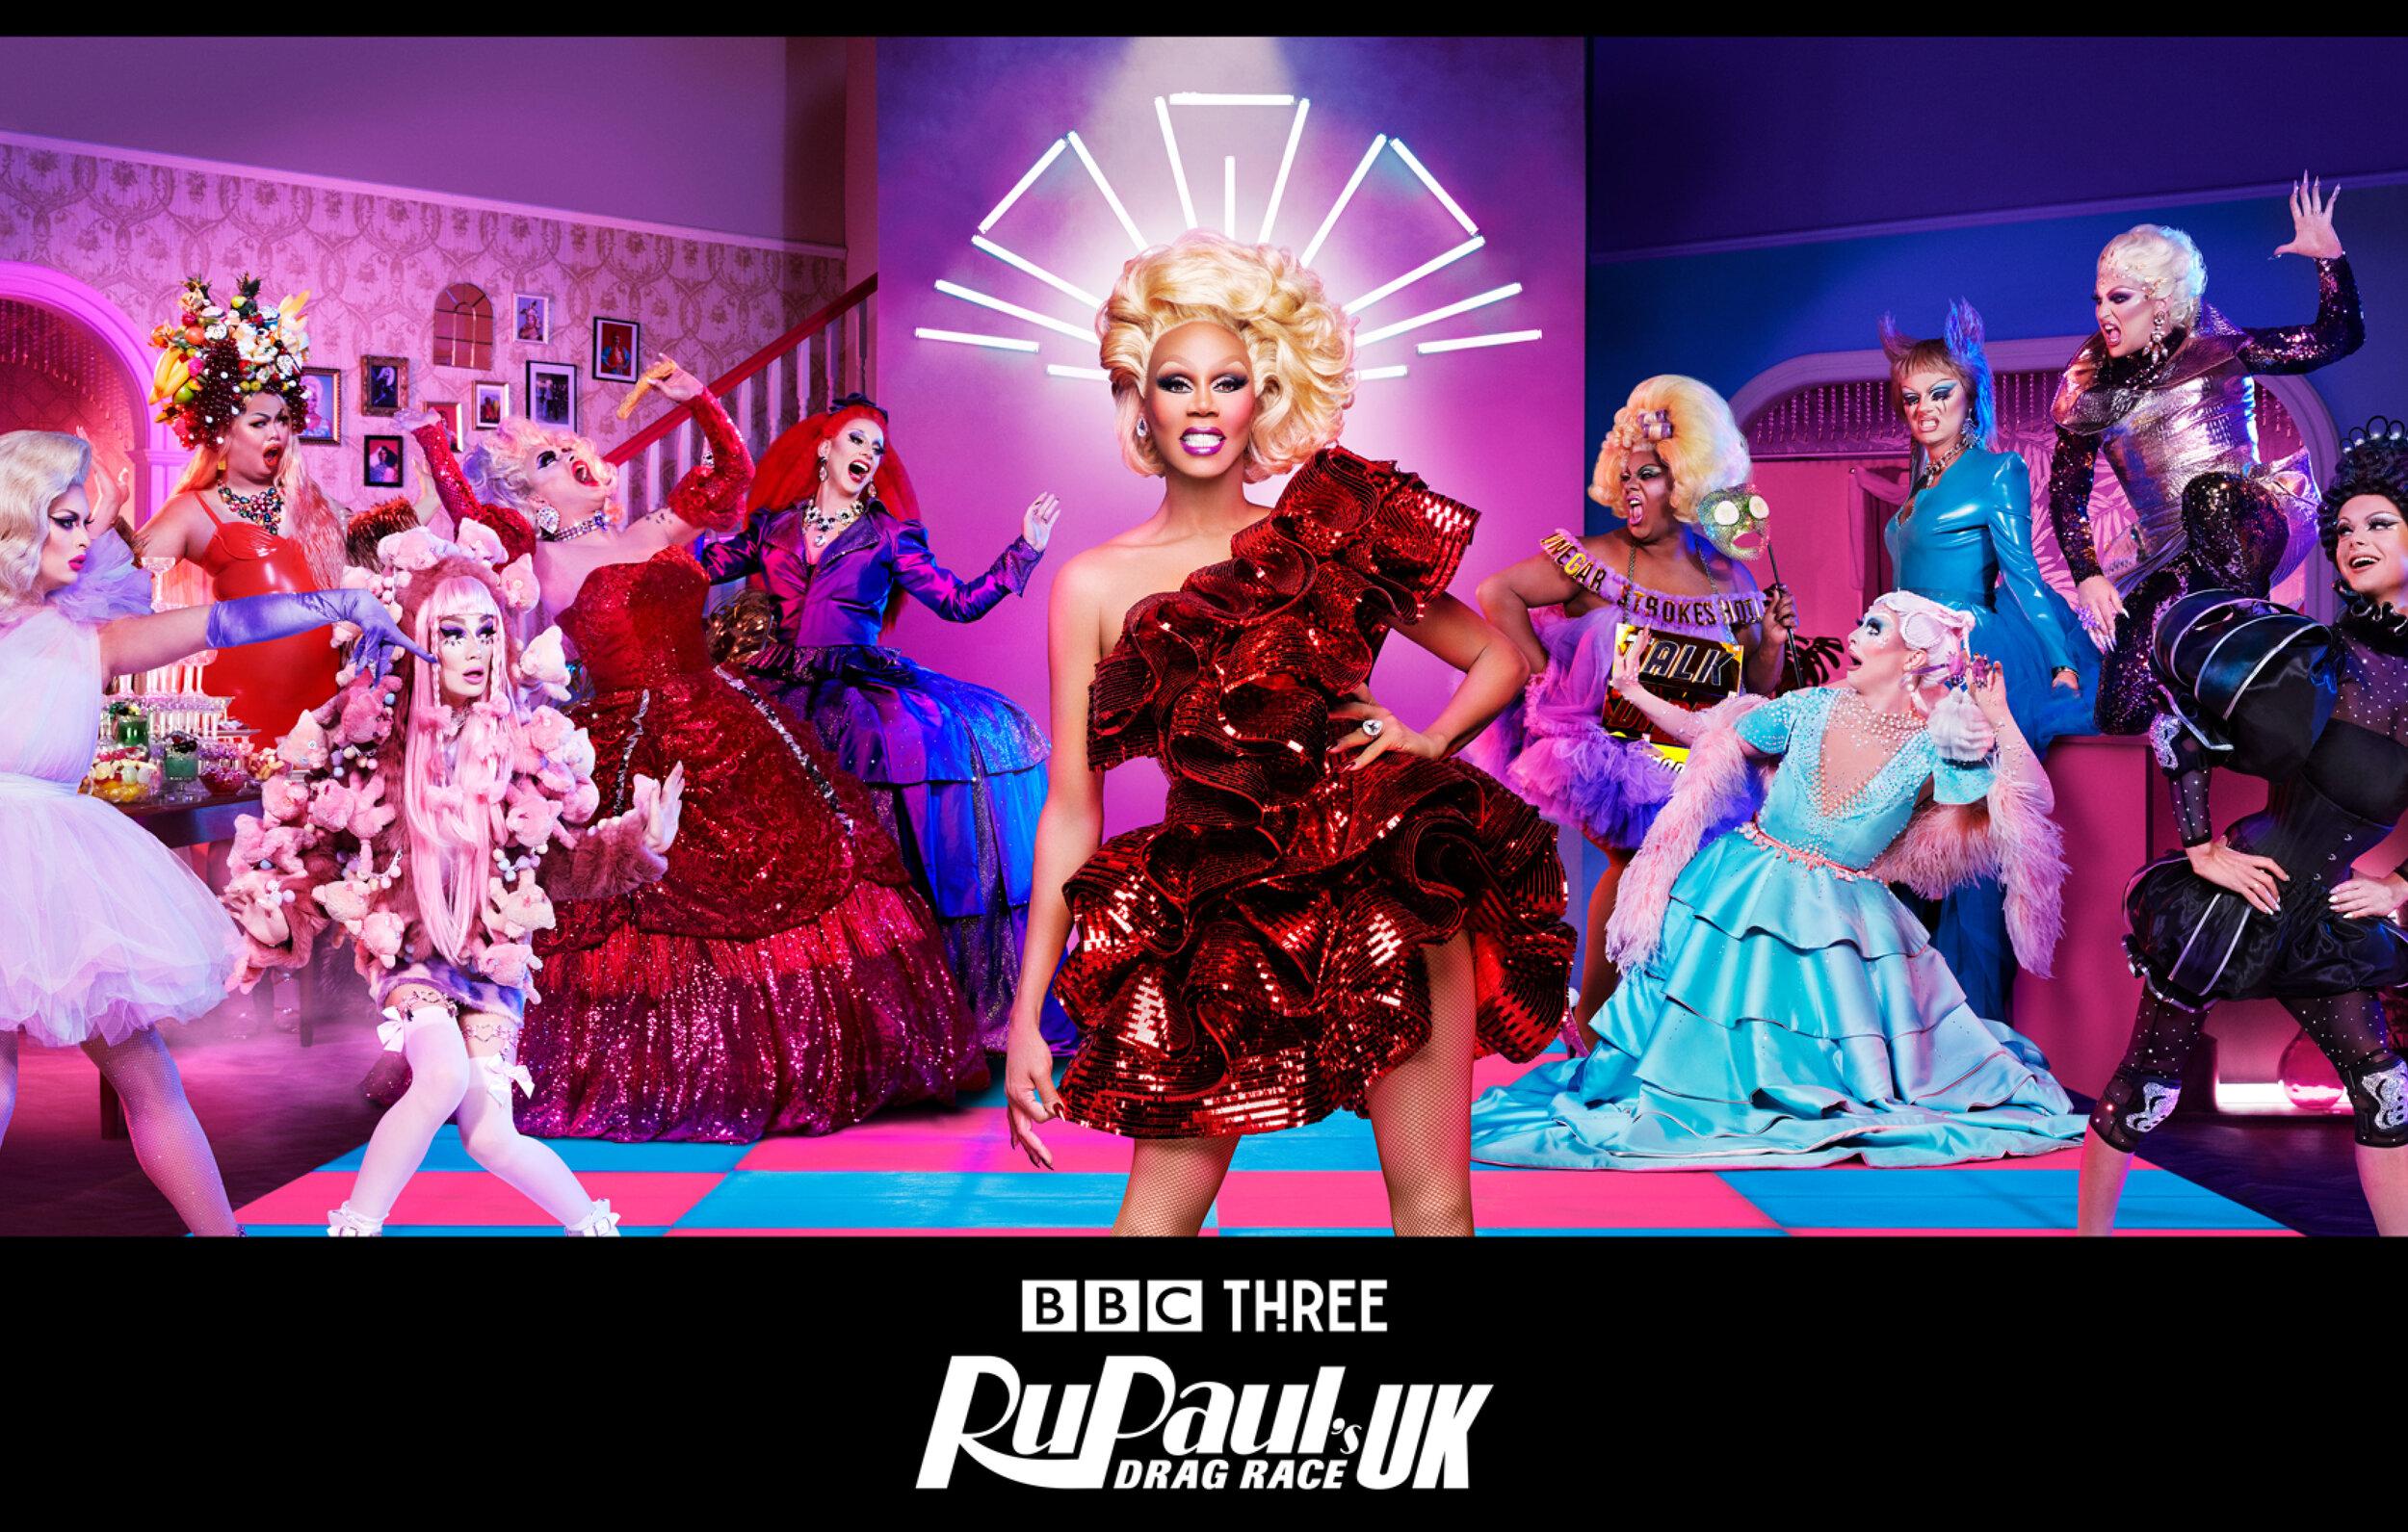 RuPaul's Drag Race UK - Key Art Campaign - BBC3